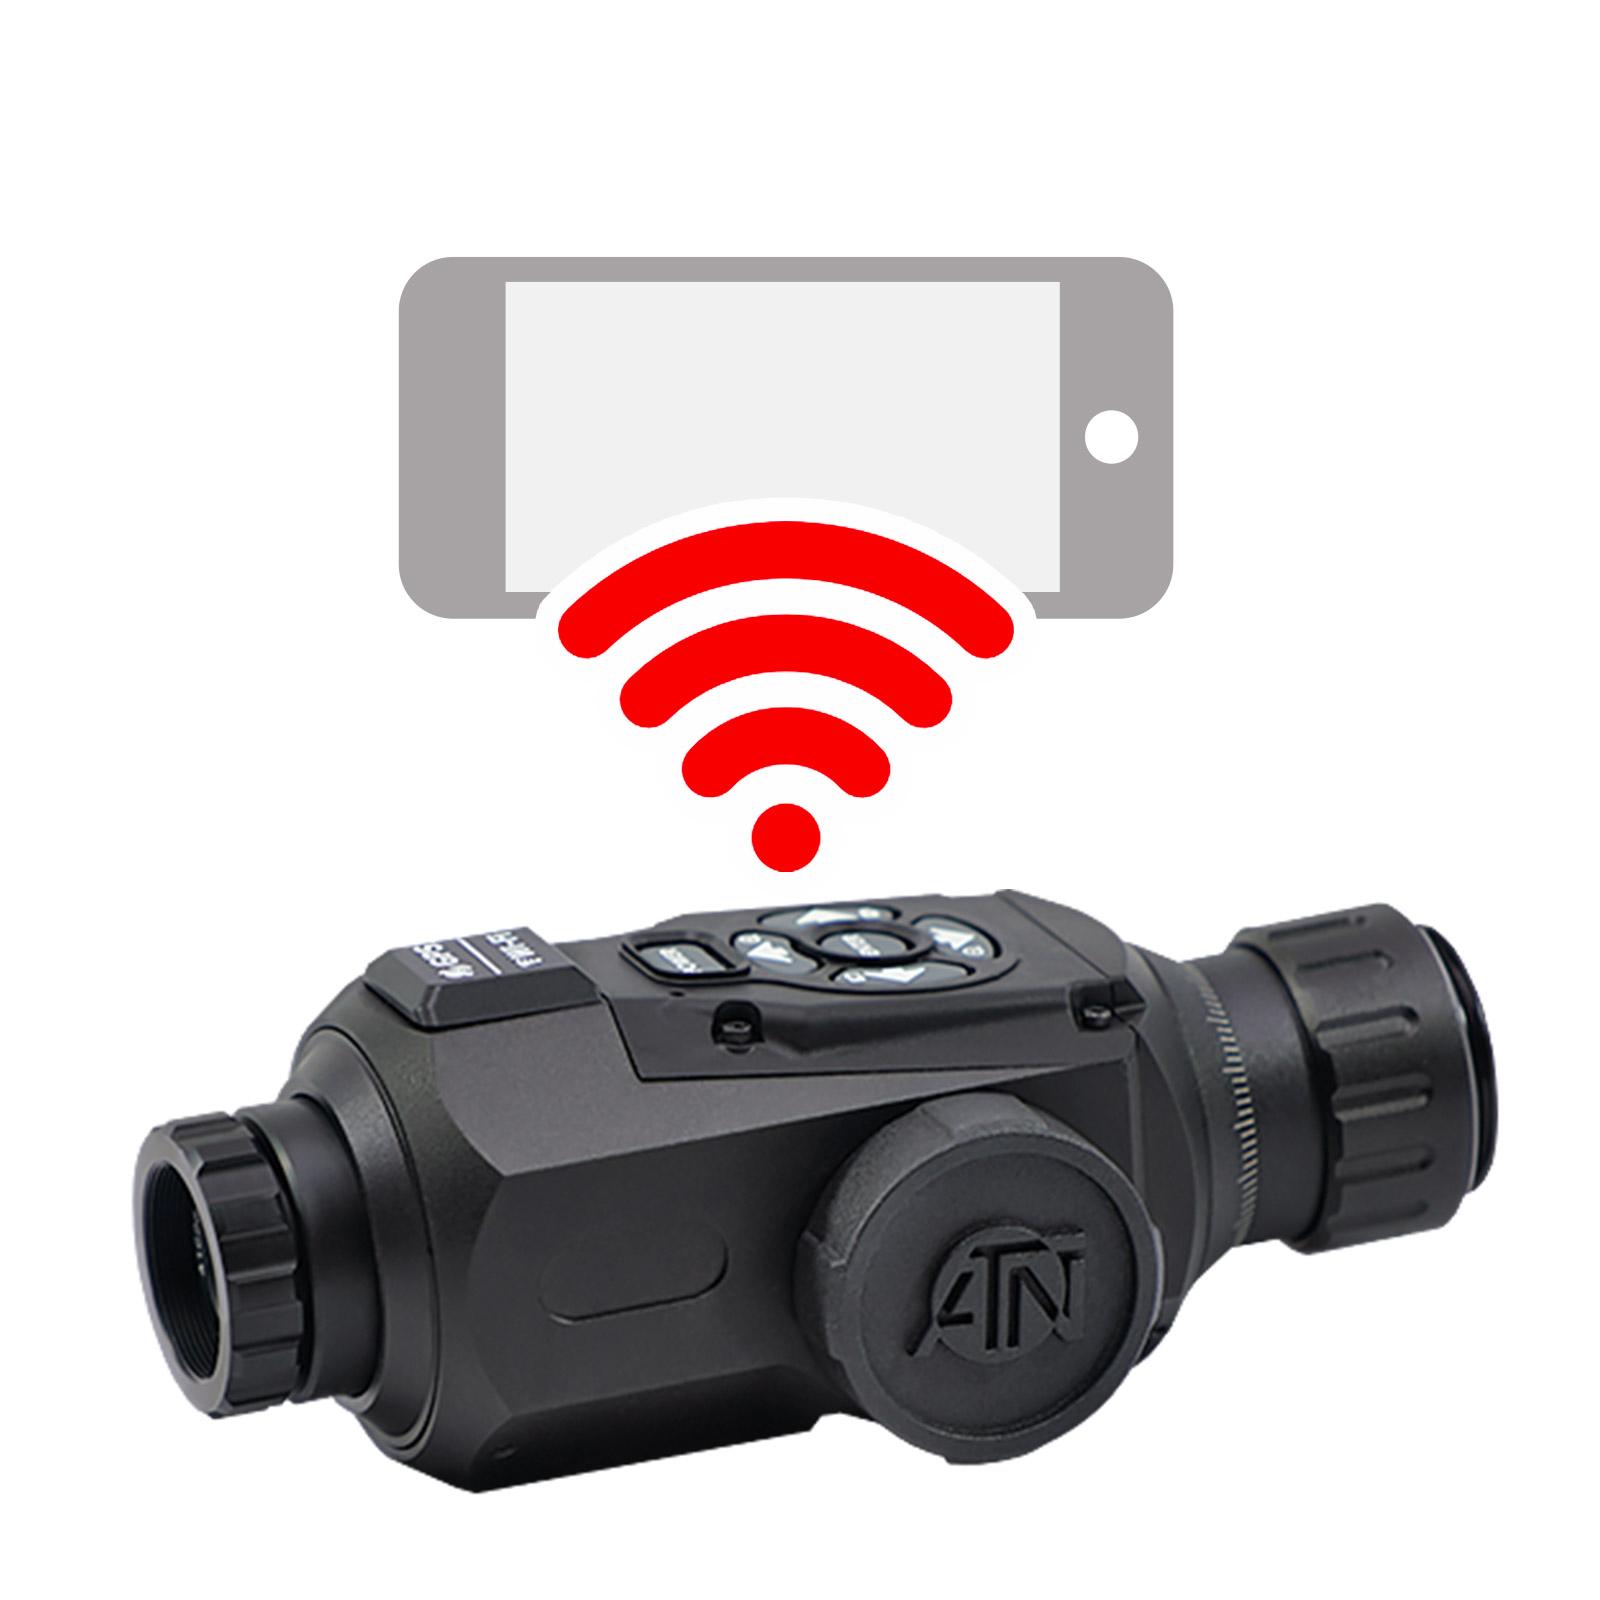 ATN OTS-HD Monocular, 1.25-5×19